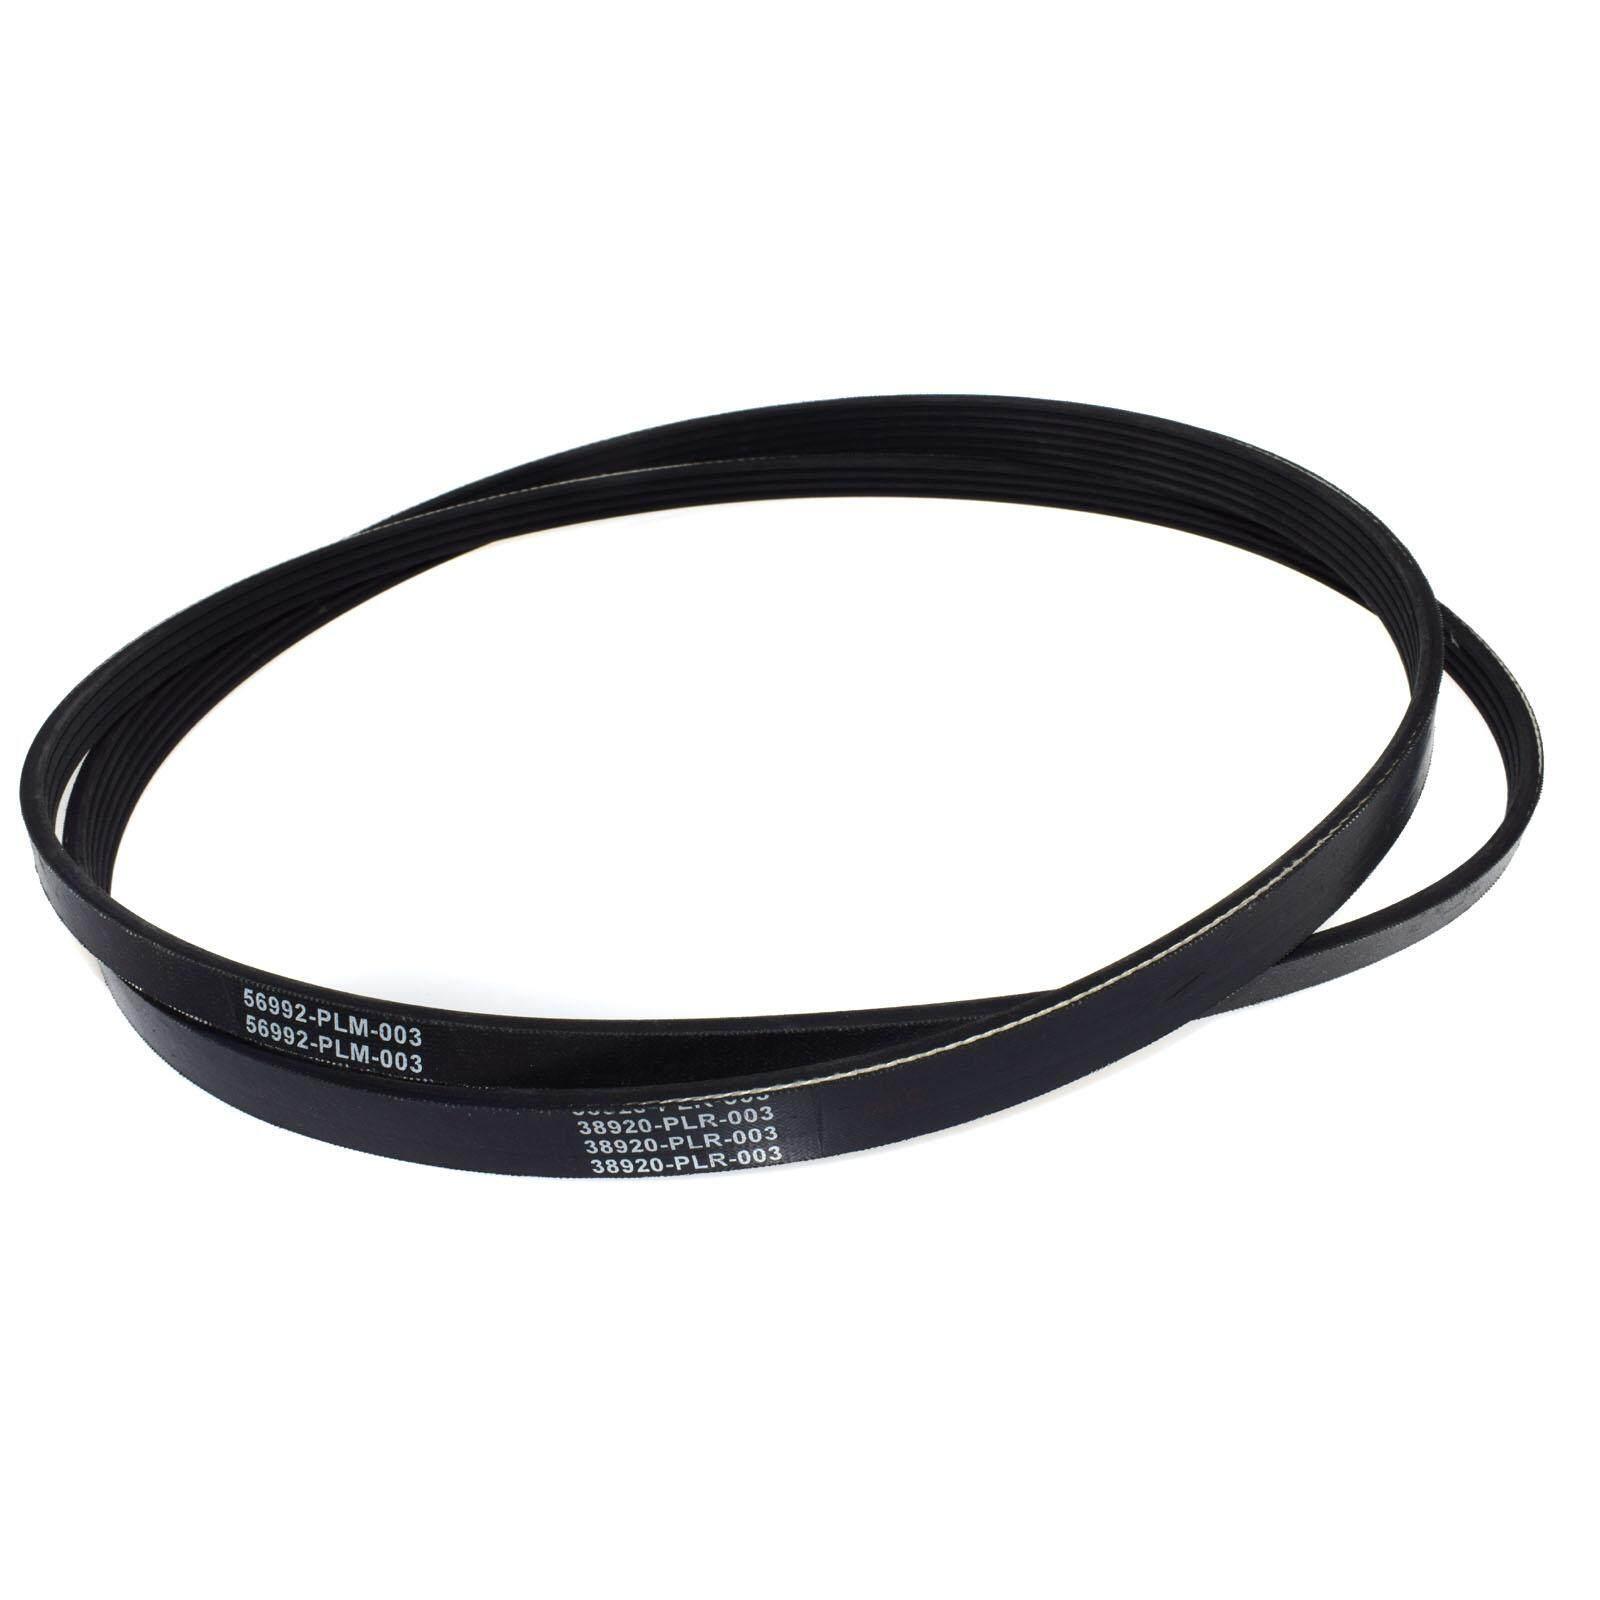 Timing Belt For Sale Alignment Online Brands Prices Honda Civic Wolfigo 2 Pcs Ribbed Drive Serpentine 2001 2005 56992 Plm